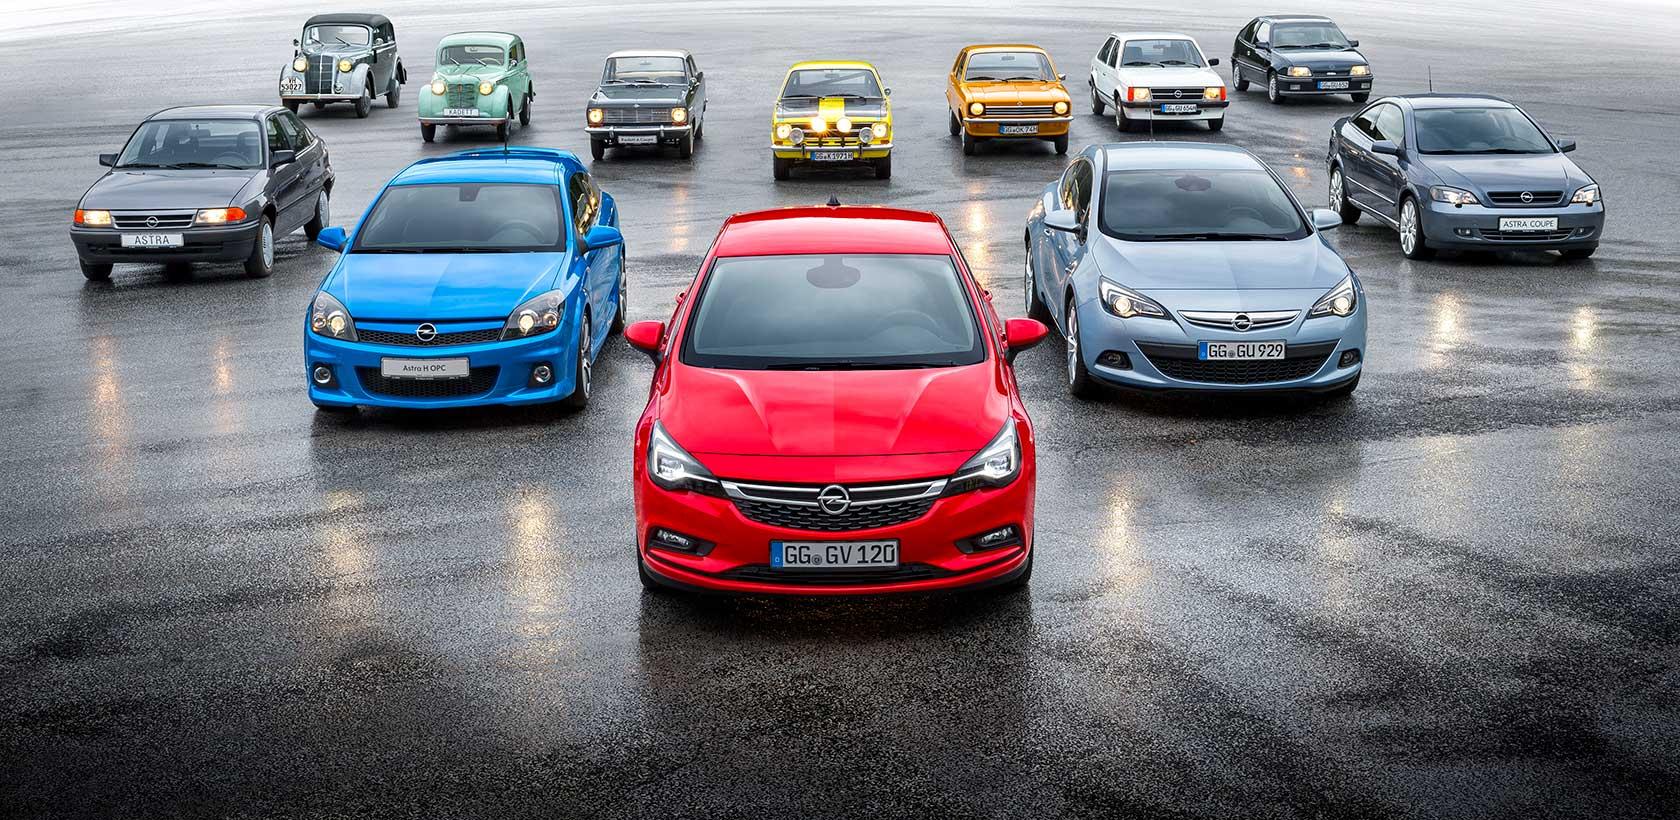 Officiel, Opel passe chez STAFIM en Tunisie